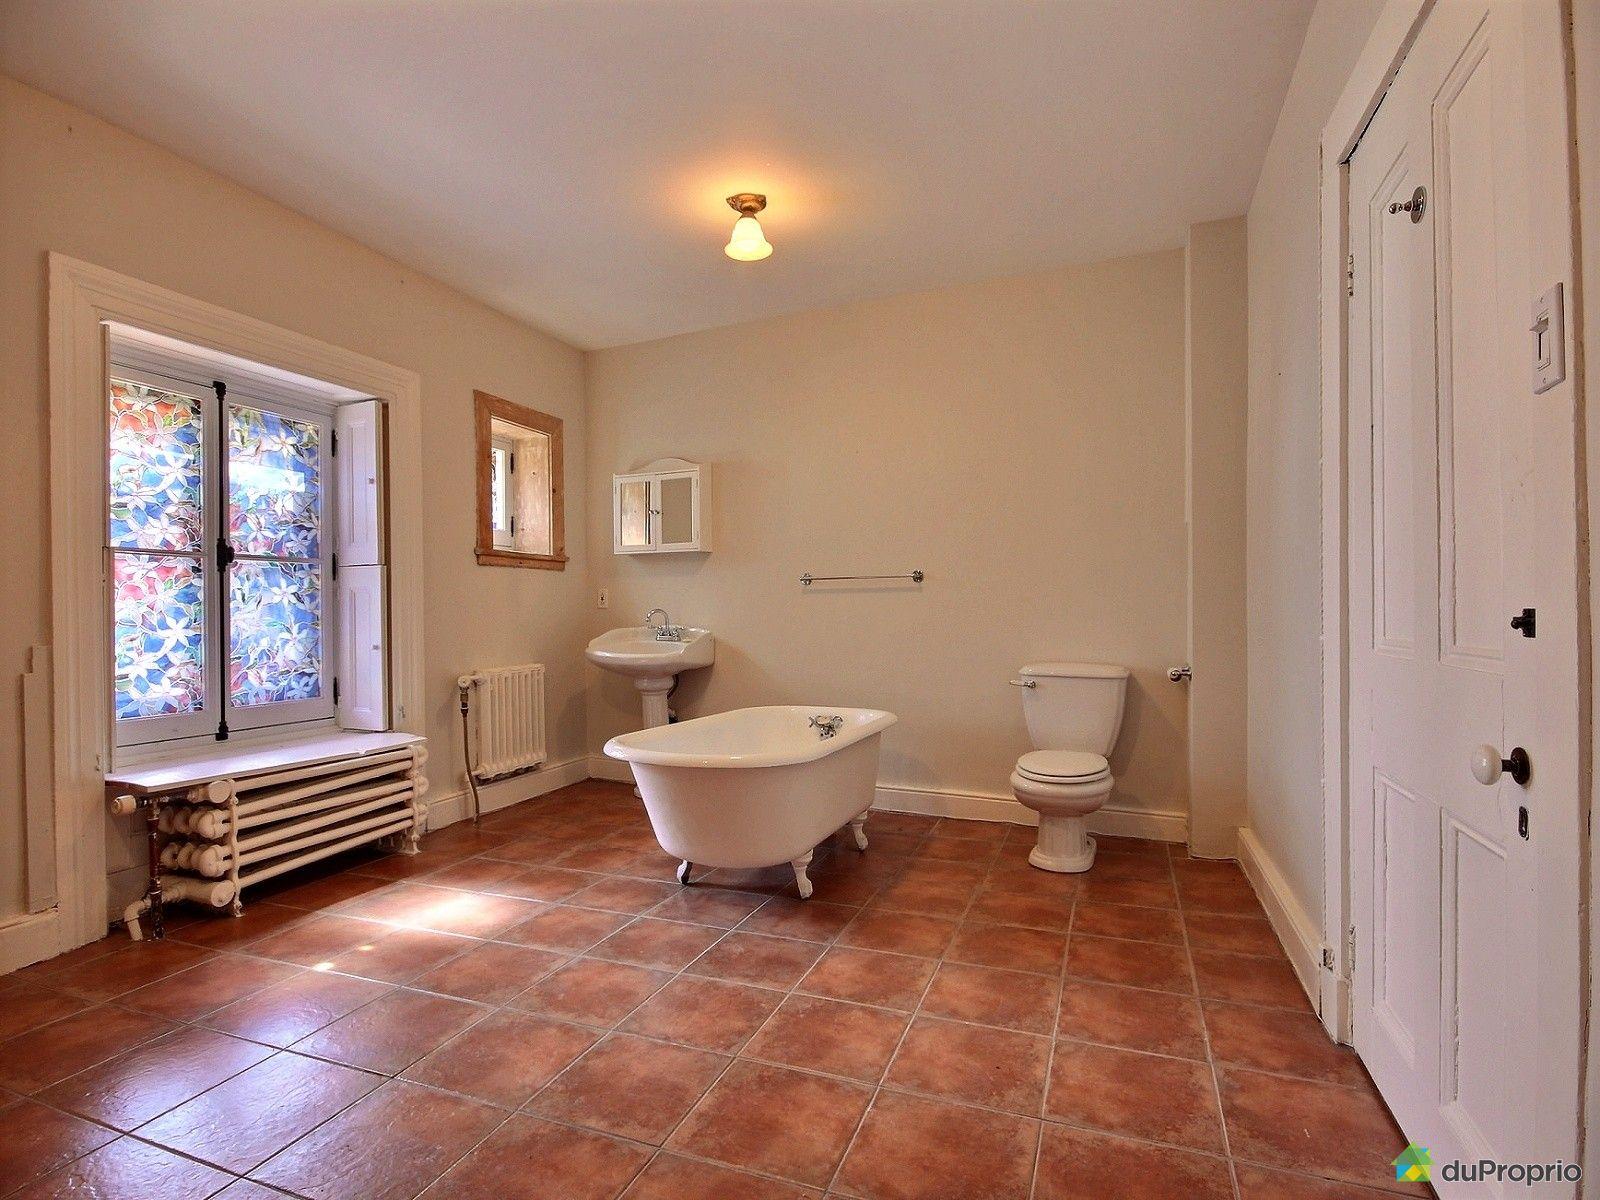 Condo vendre vieux qu bec 2 11 rue des remparts for Reno salle de bain quebec